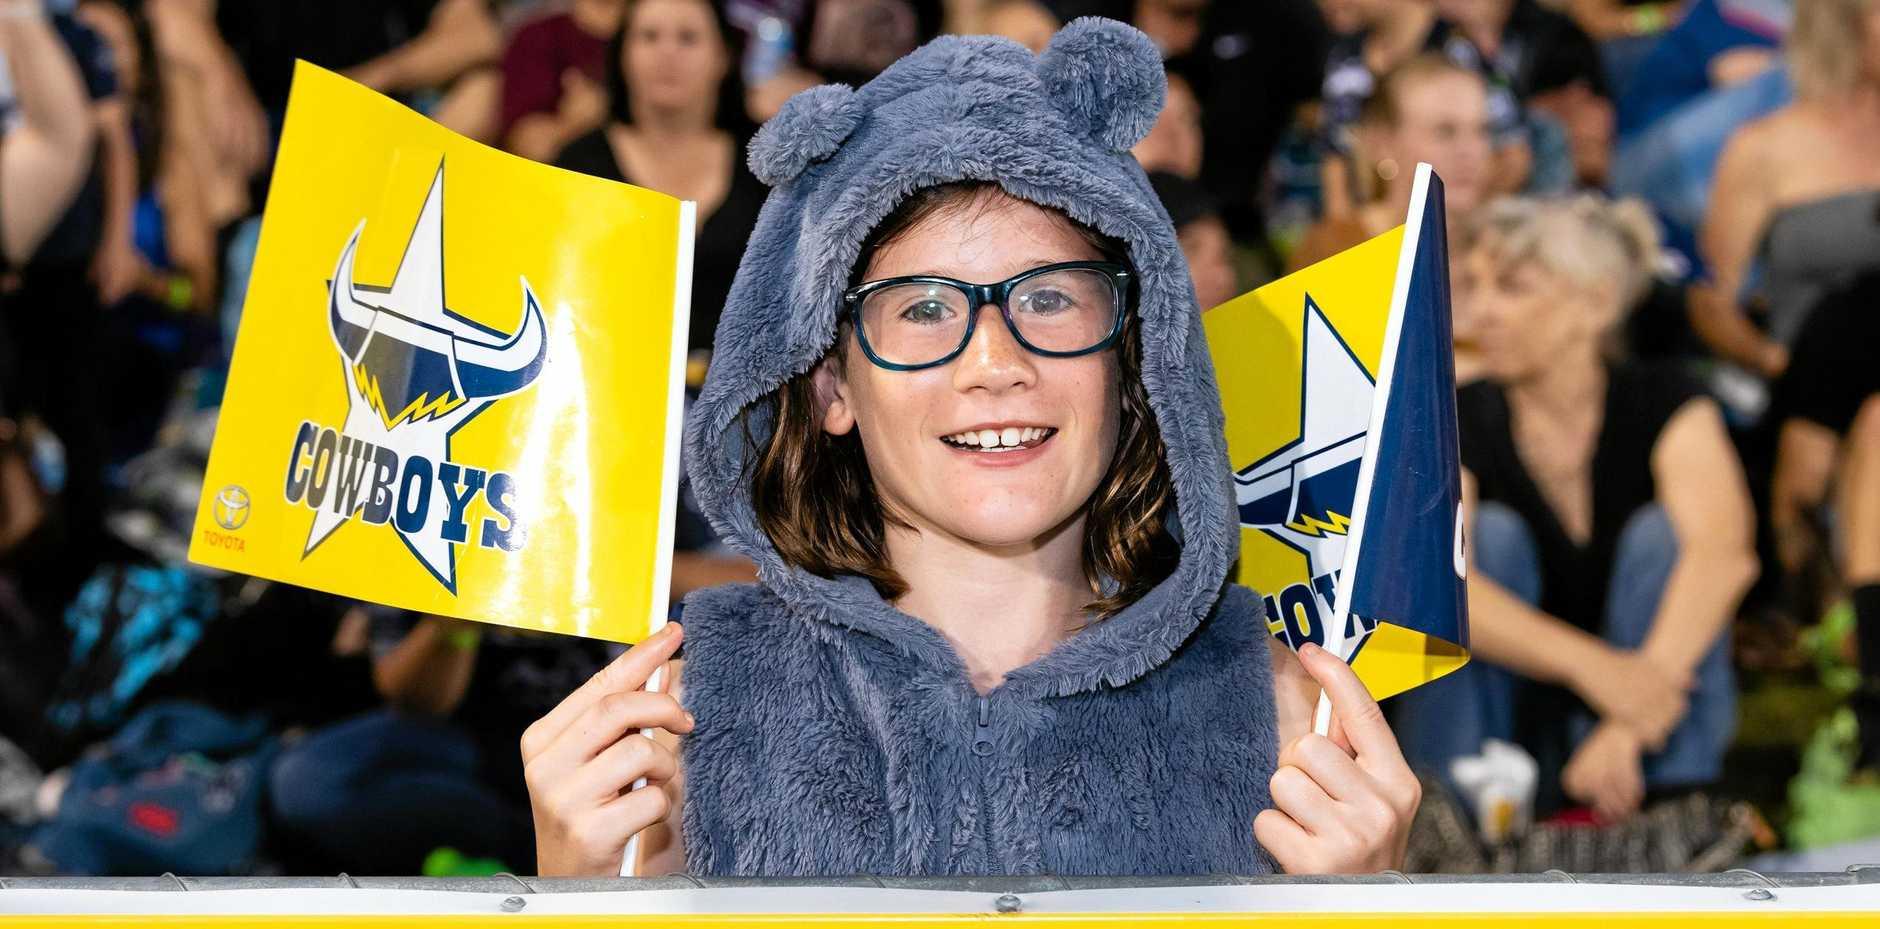 Cowboys fan Sienna Gilbert, 10.